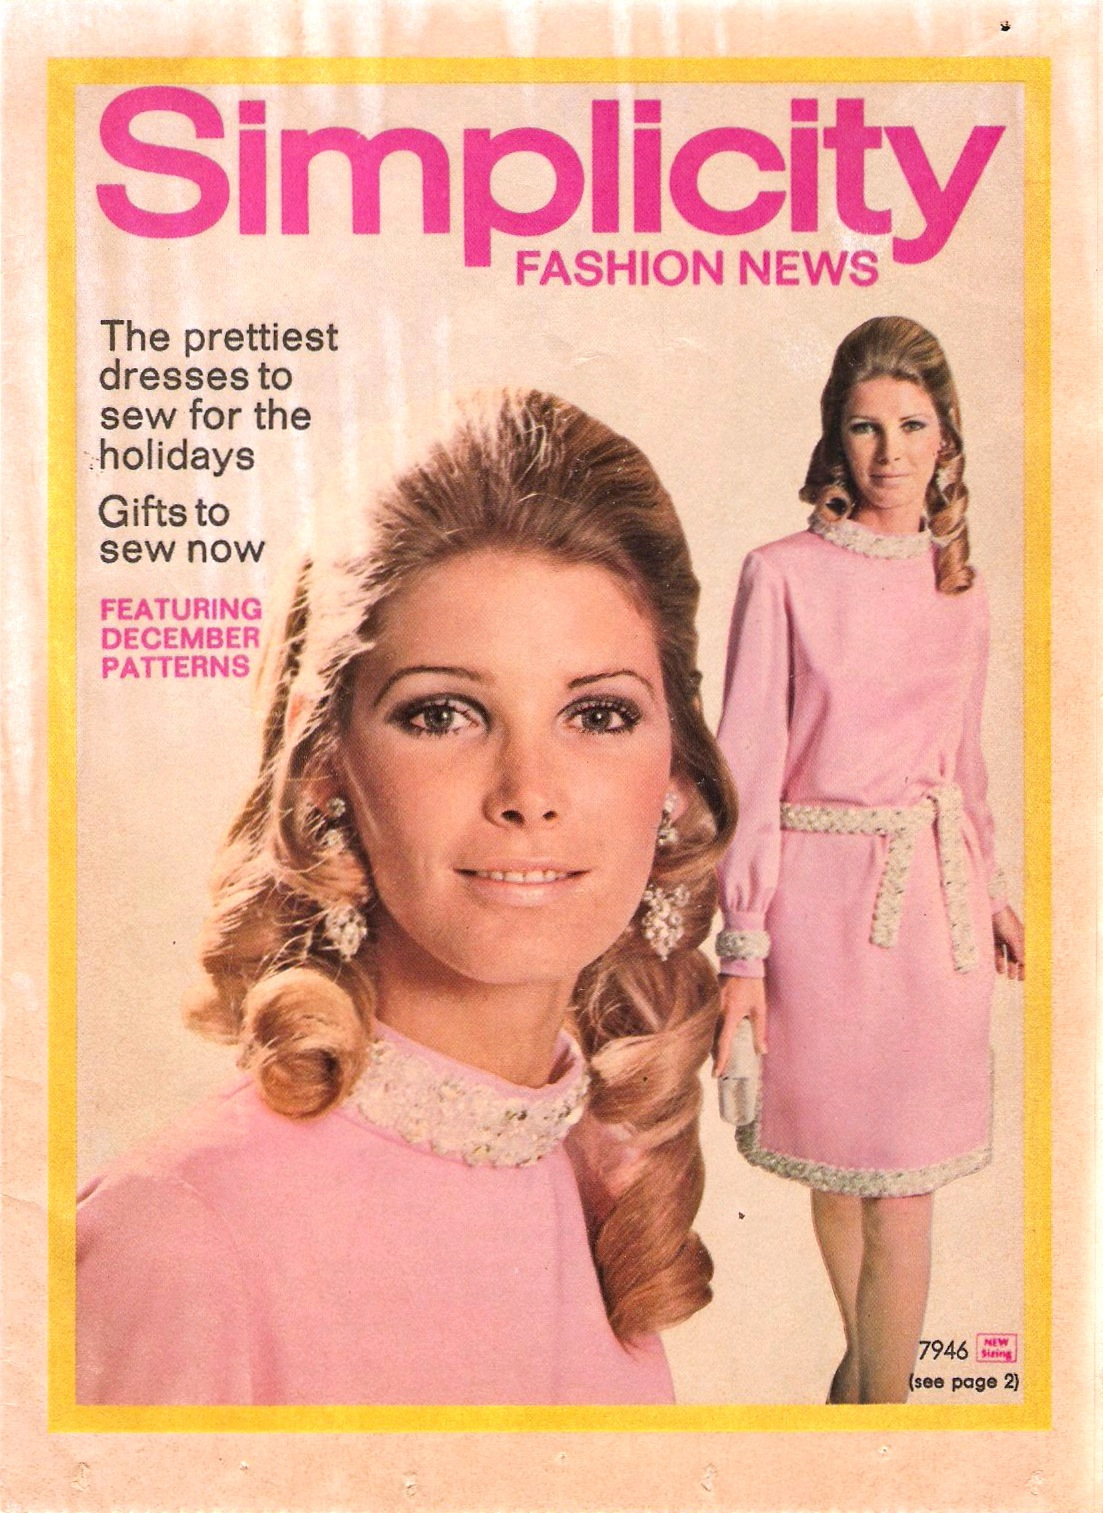 Simplicity Fashion News December 1968